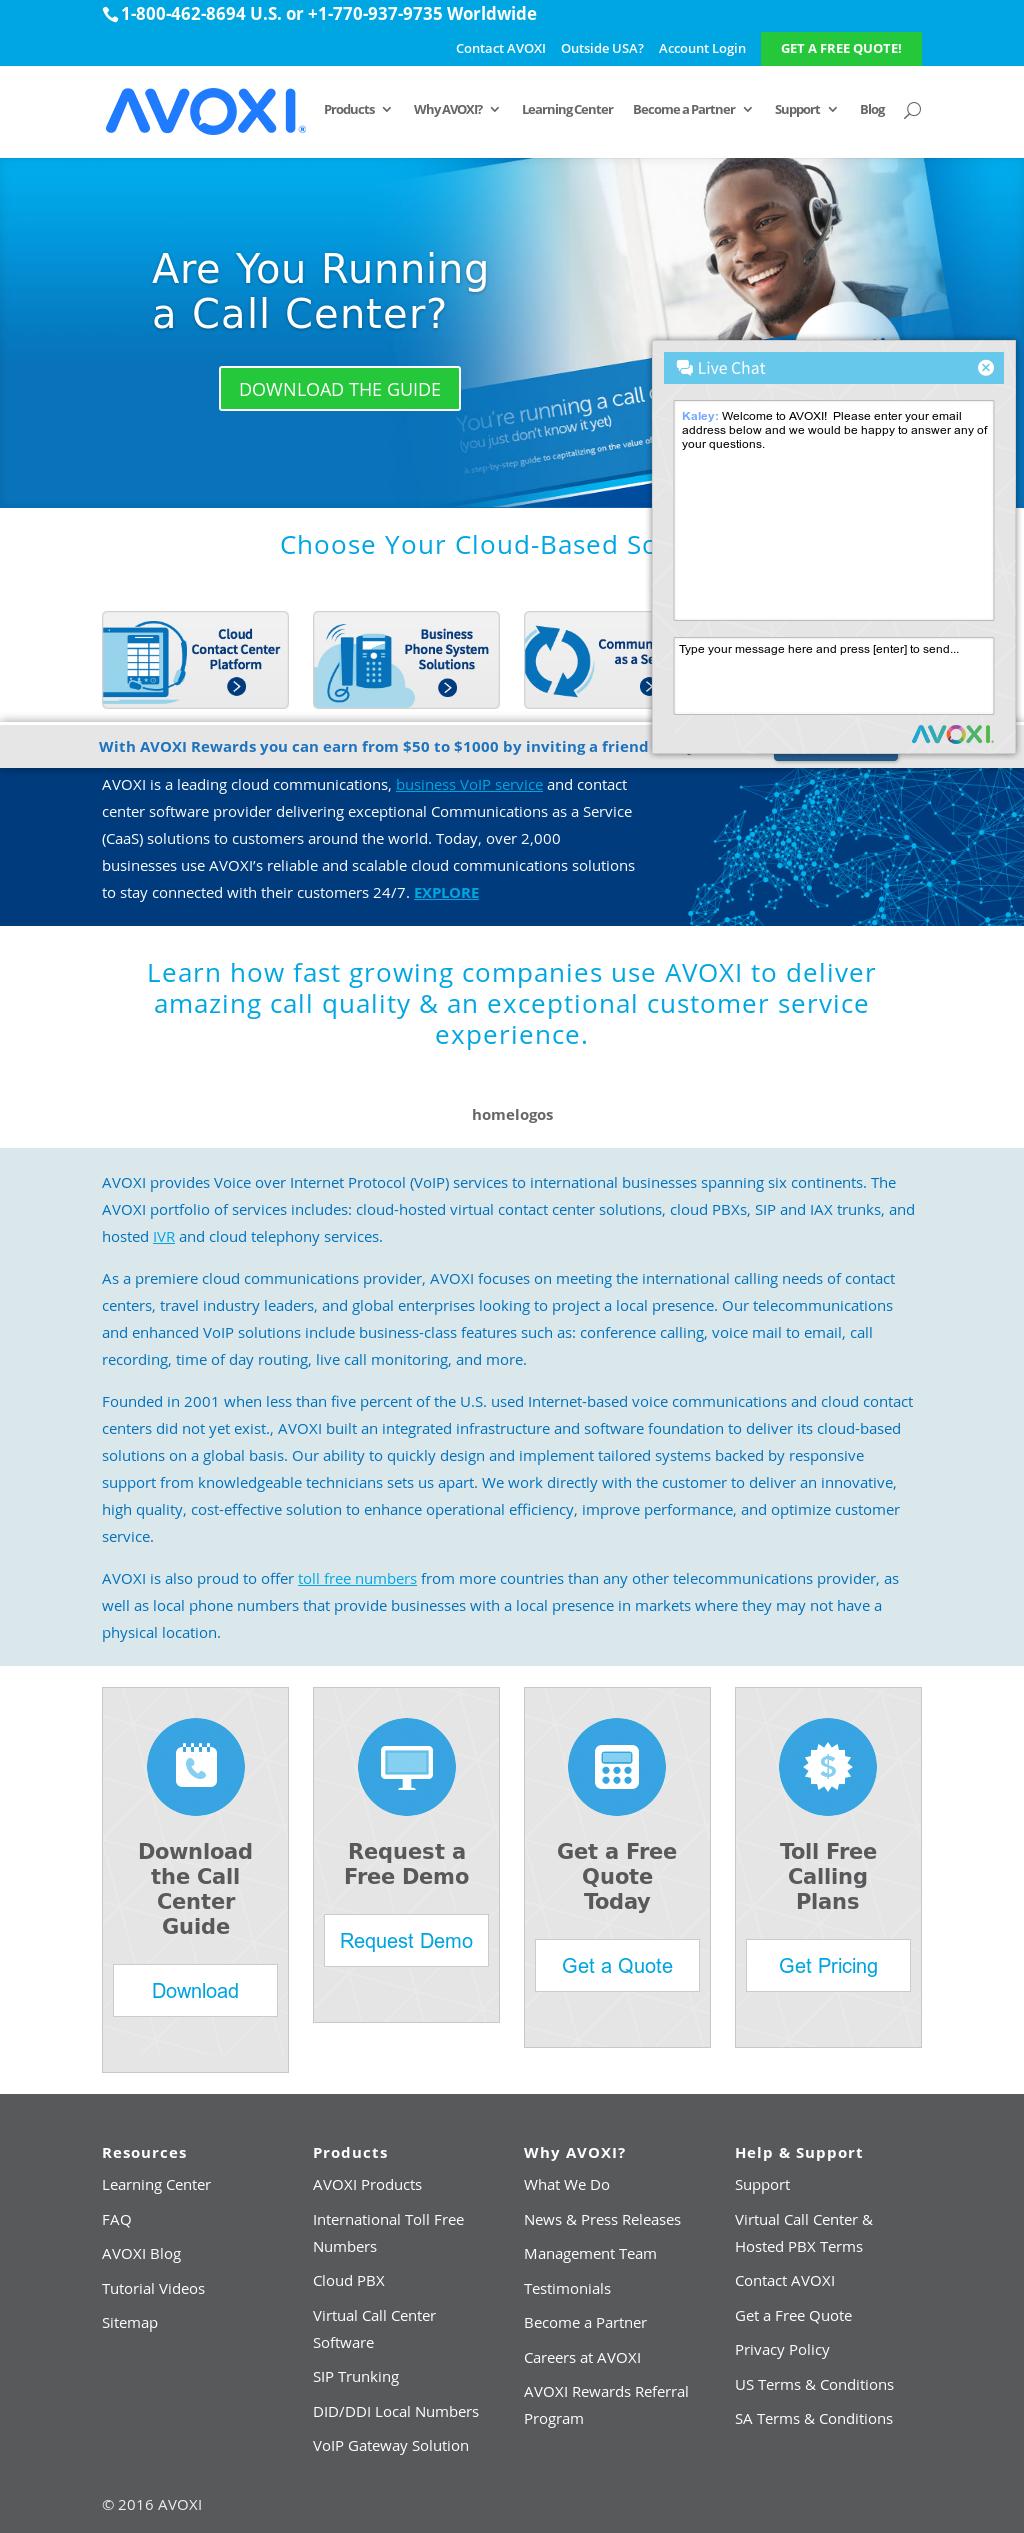 AVOXI Competitors, Revenue and Employees - Owler Company Profile